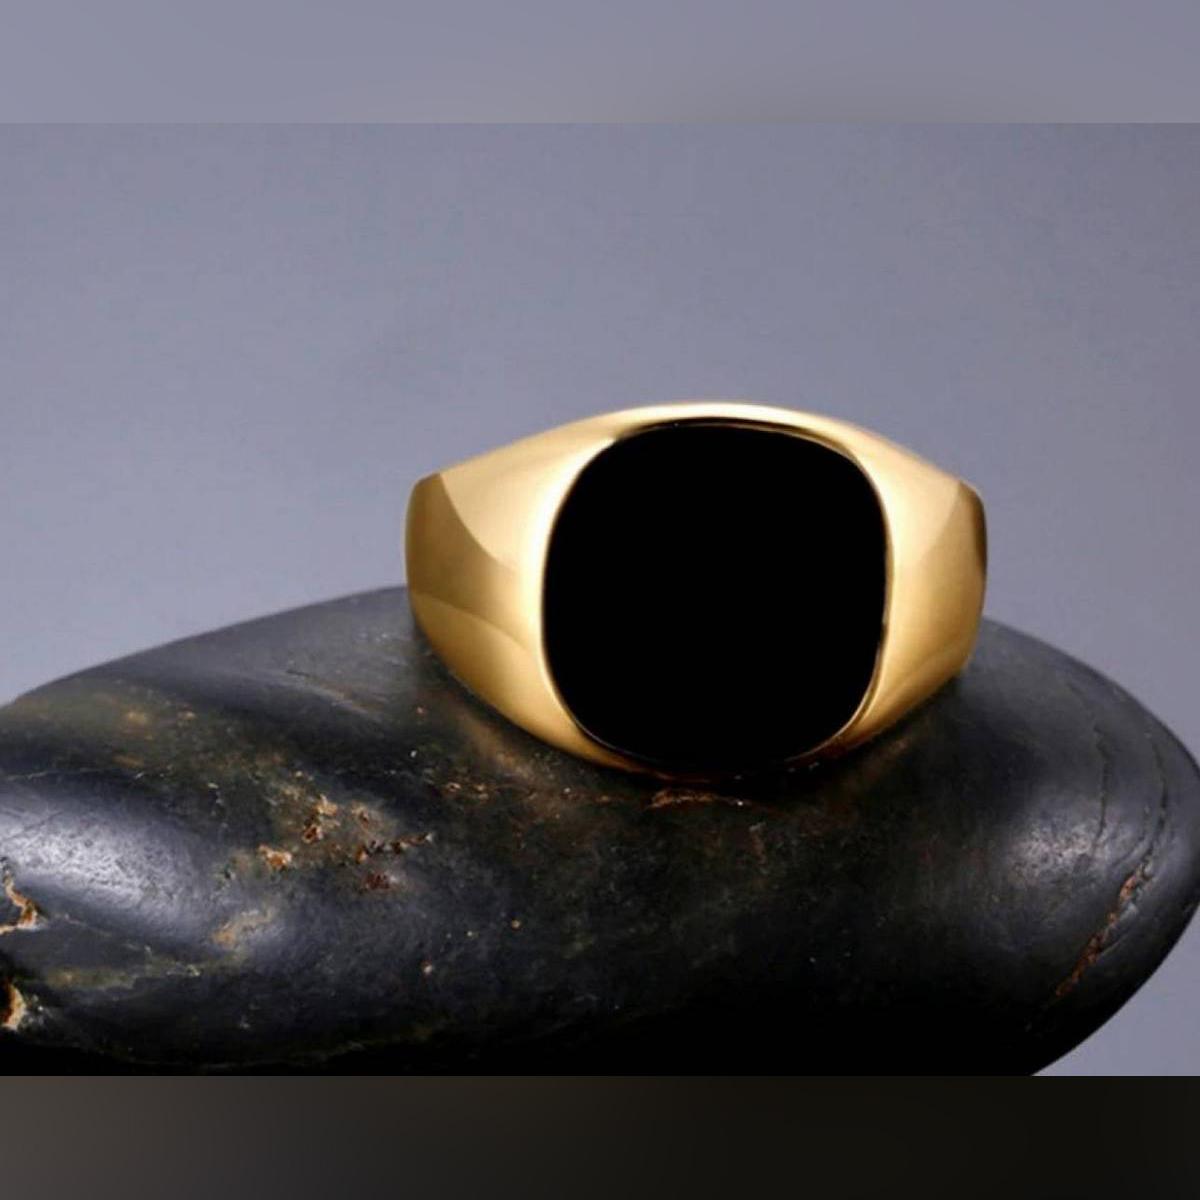 Men's Ring Stainless Steel Black Yellow Golden Engagement Wedding Ring Men'S Ring